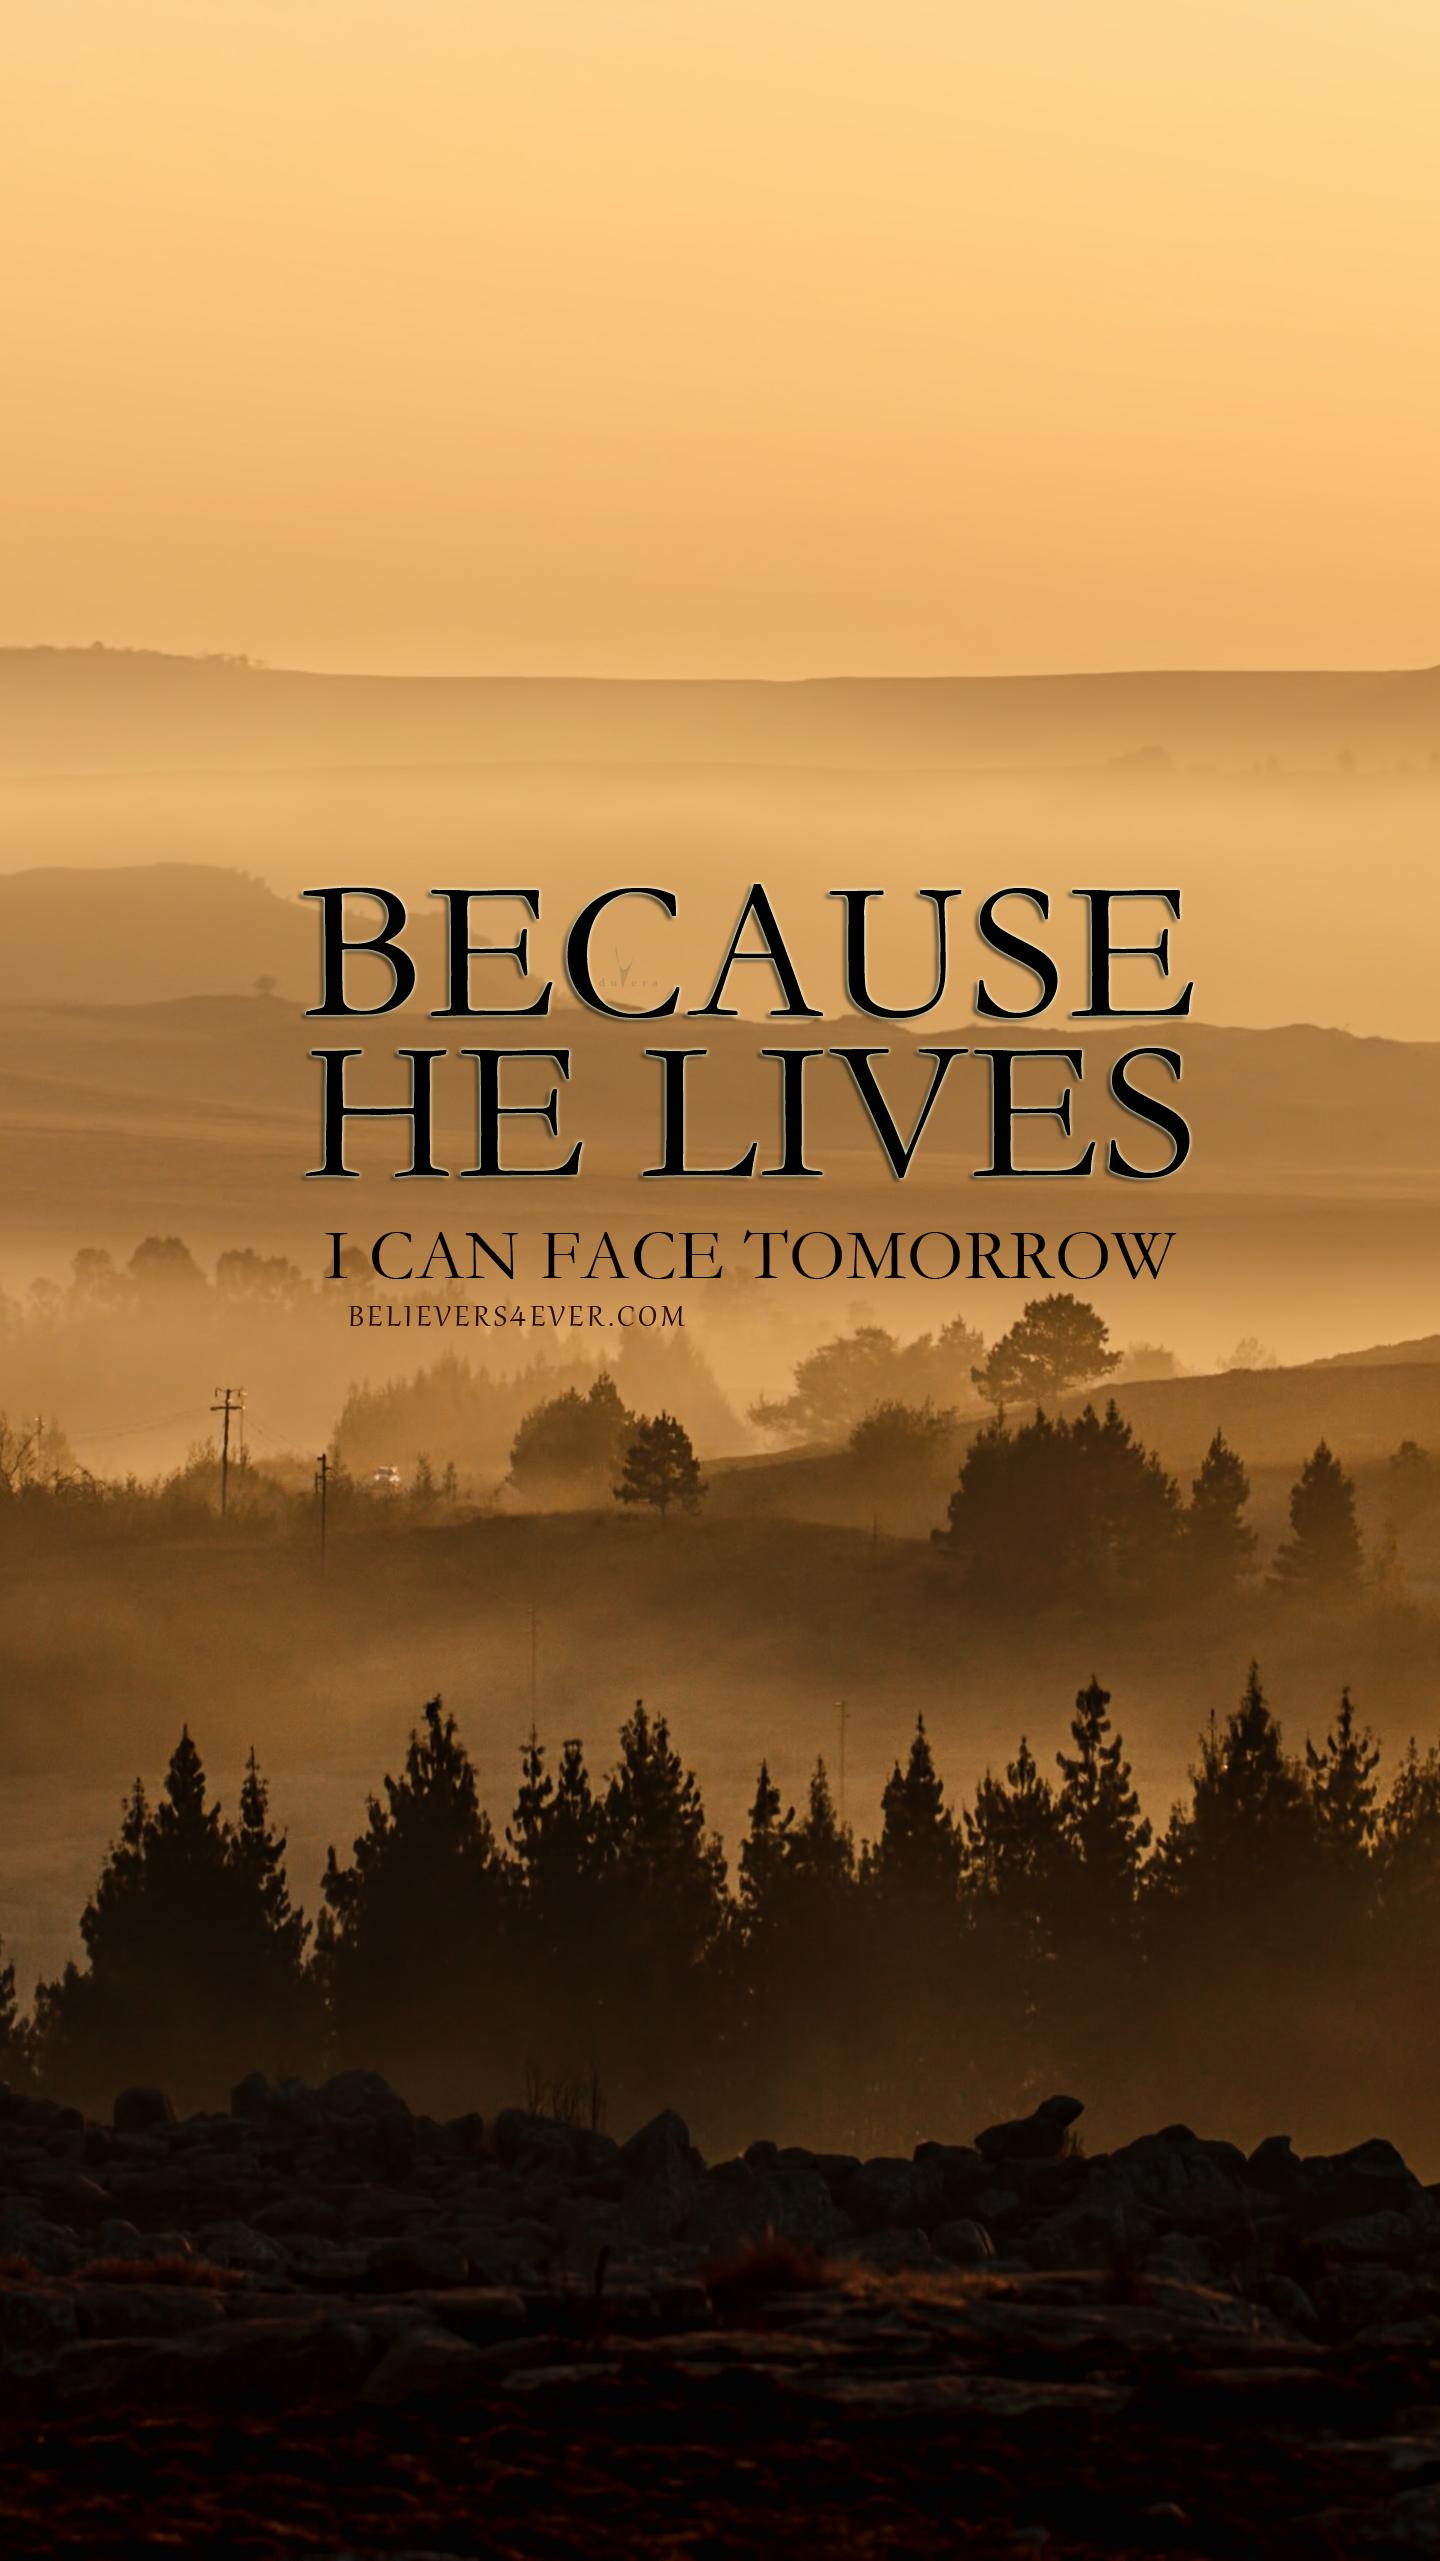 Because He lives | Warrior | Wallpaper bible, Christian iphone wallpaper, Bible verse wallpaper